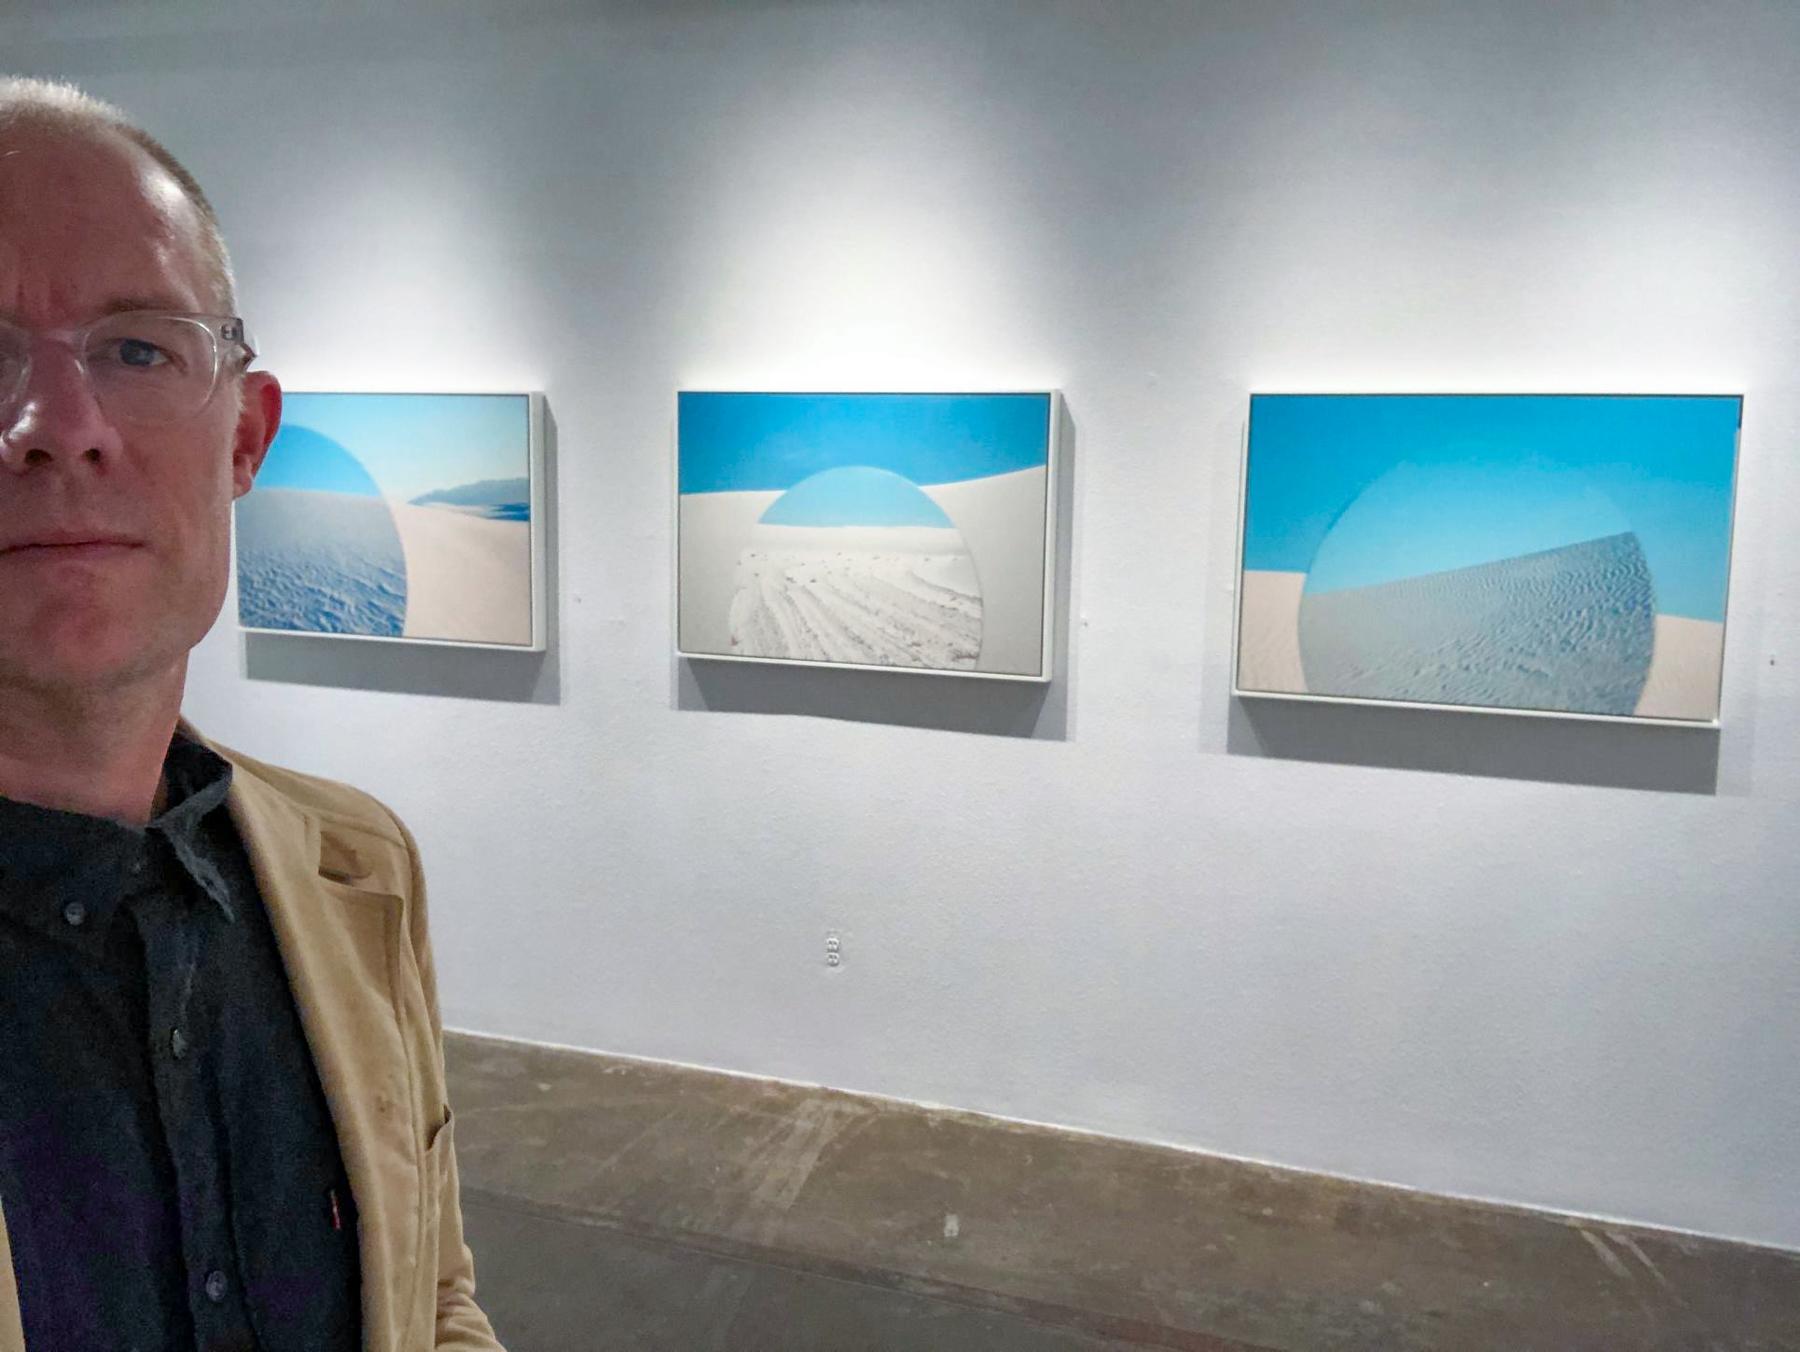 Installation View - Walker Fine Art - March 2019